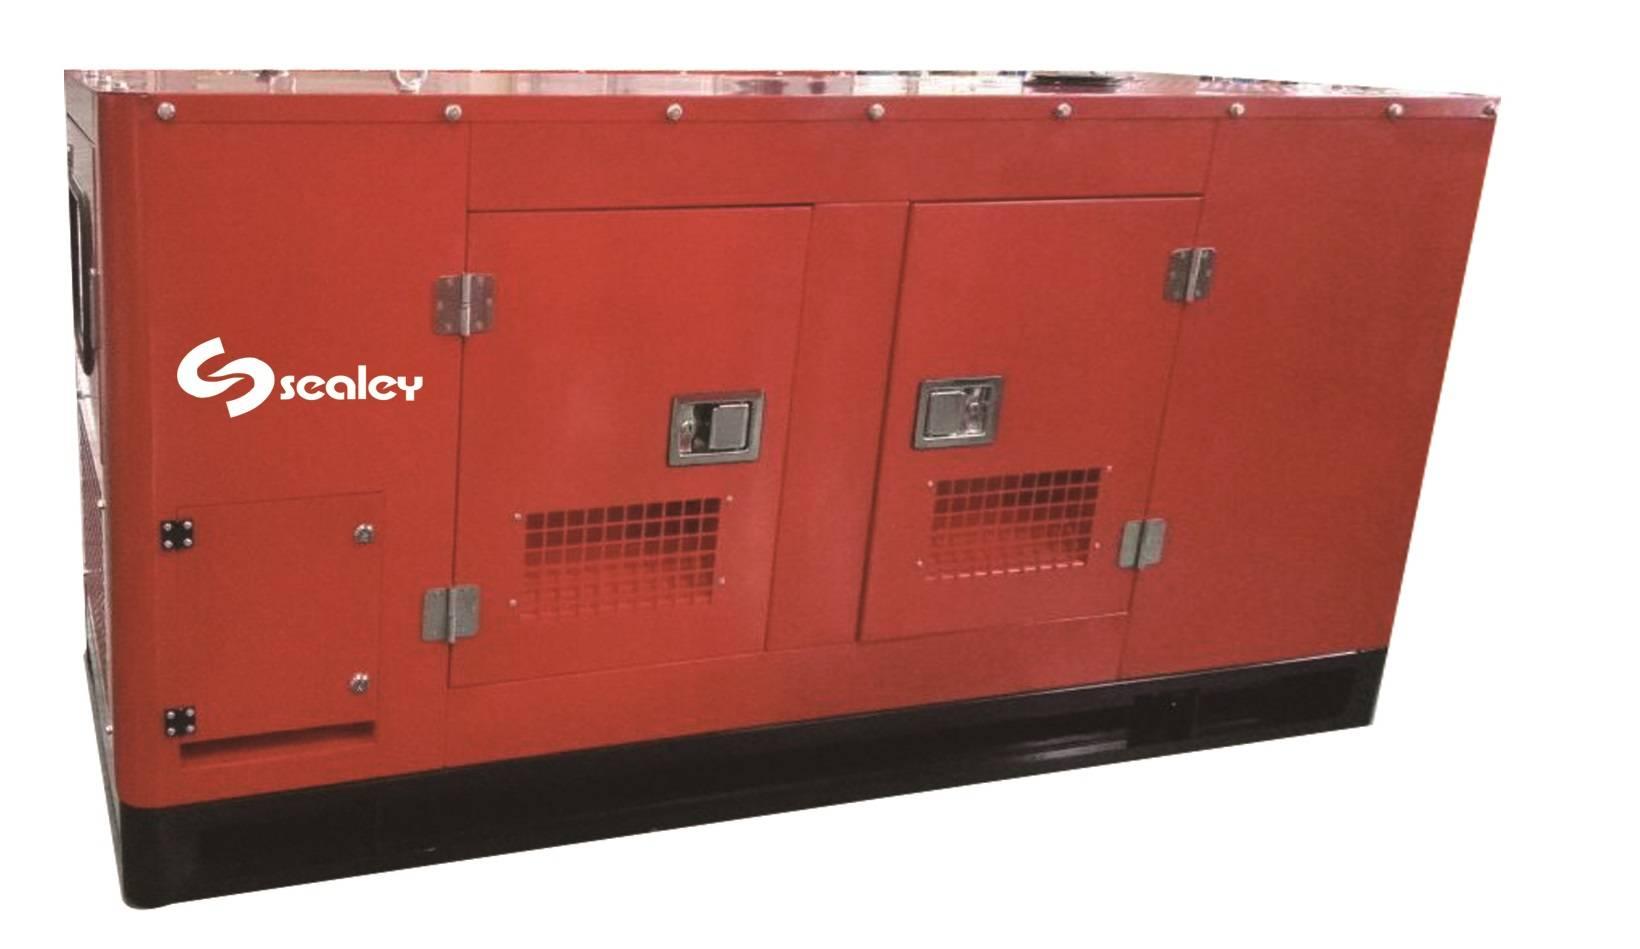 Sealey Enterprise Corporation